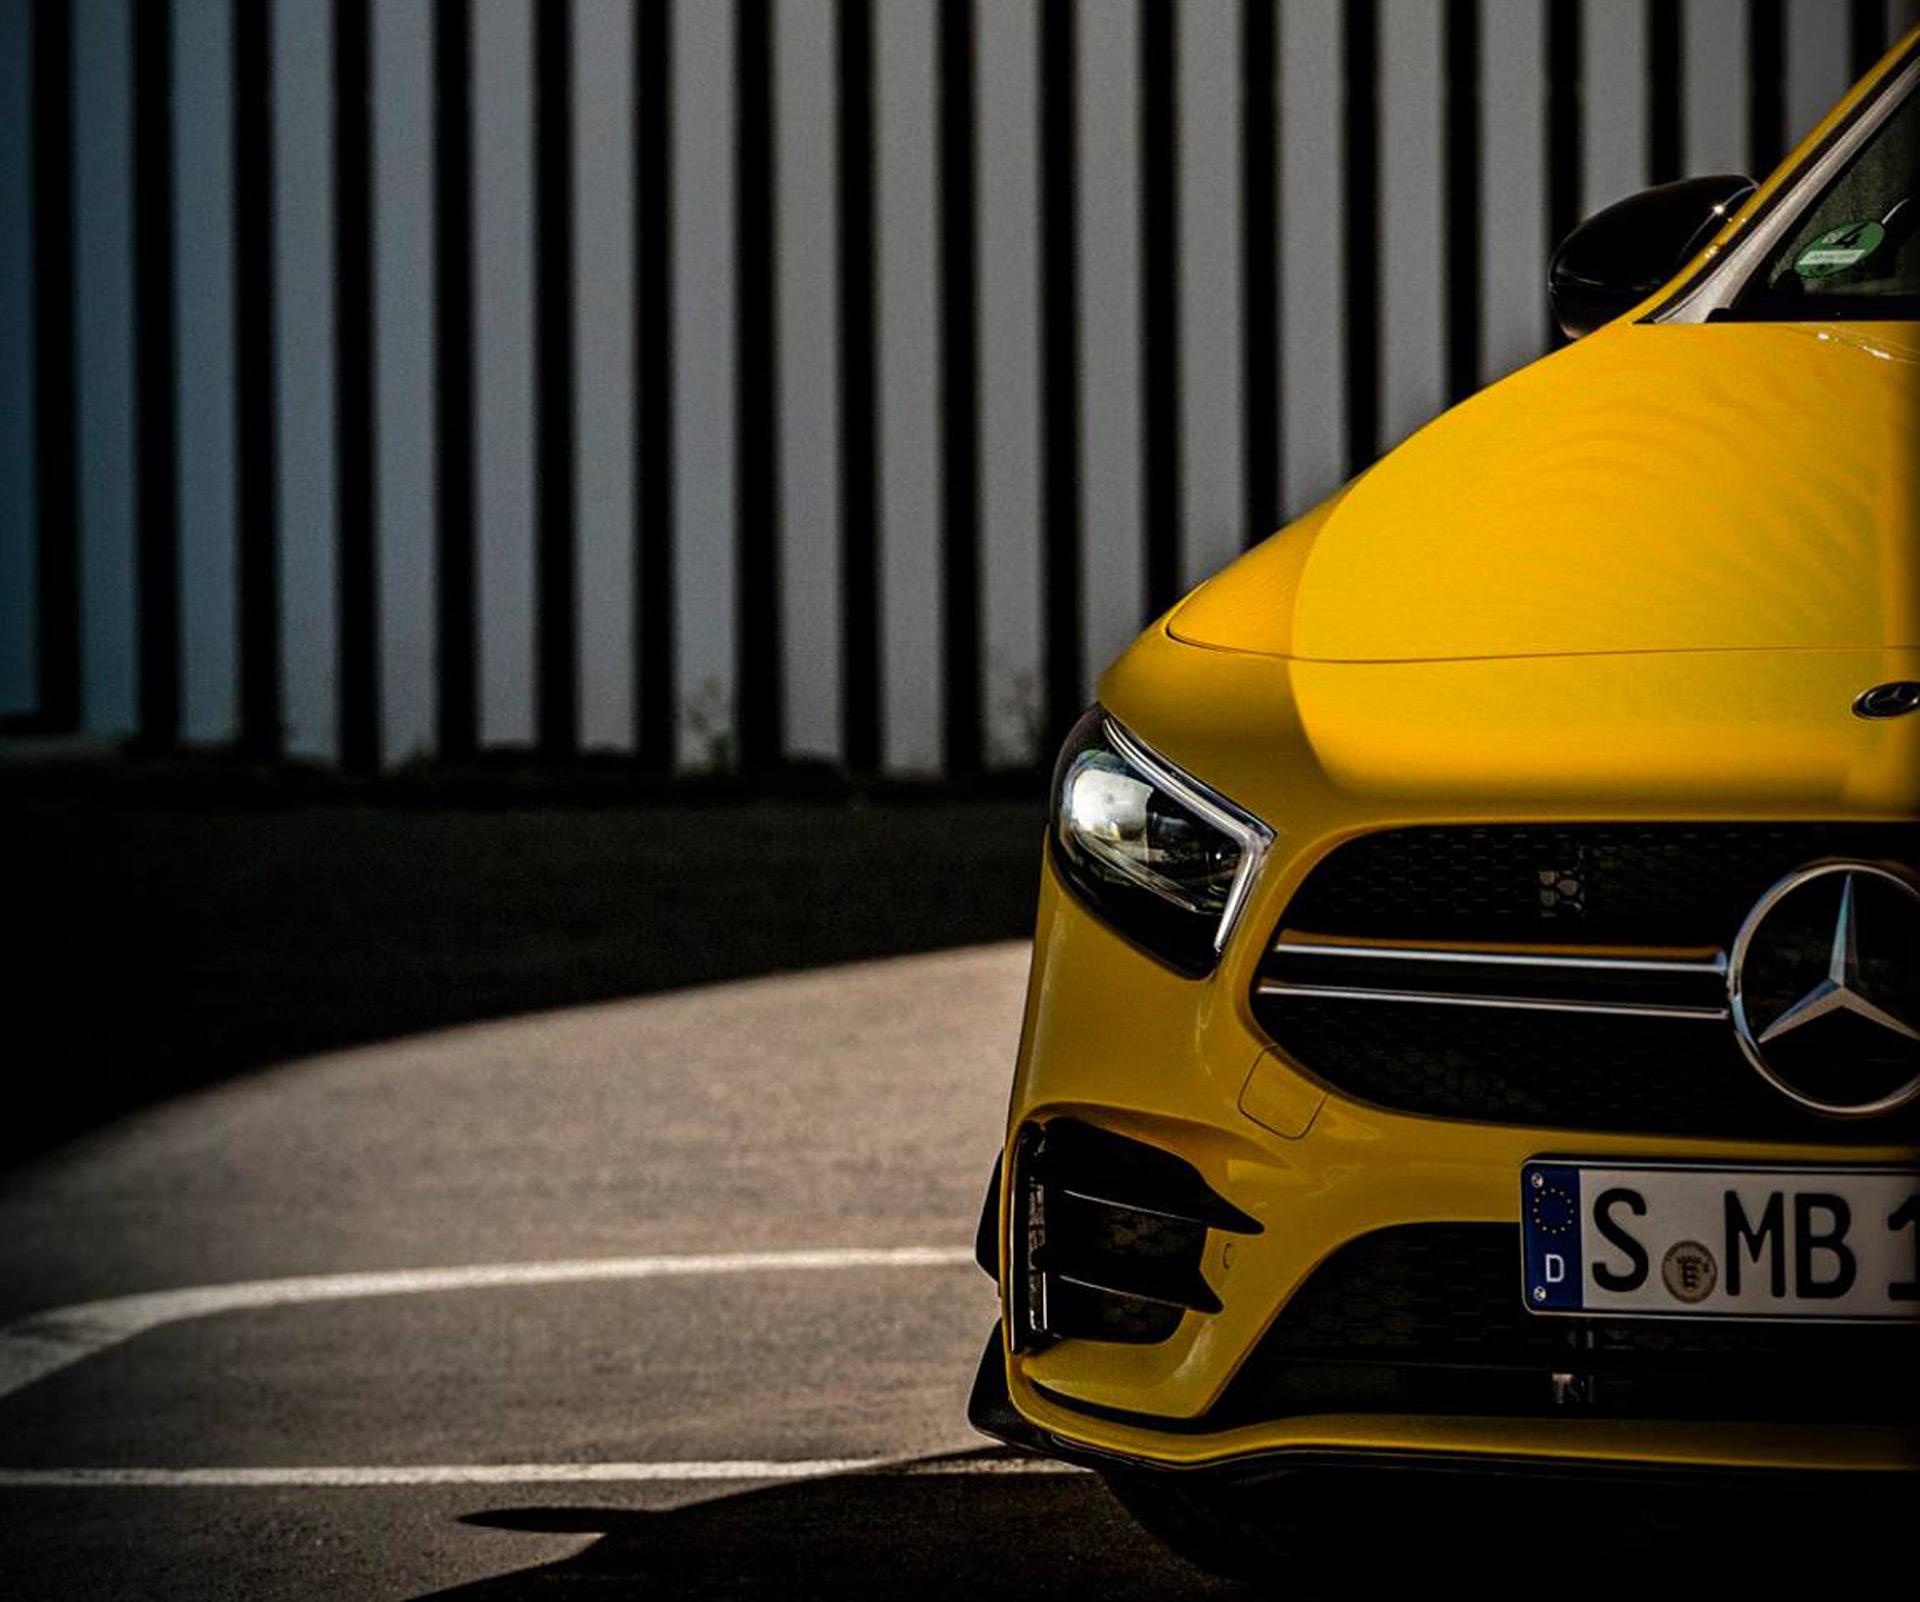 Mercedes AMG A35 hot hatch teased ahead of 2018 Paris auto show 1920x1602